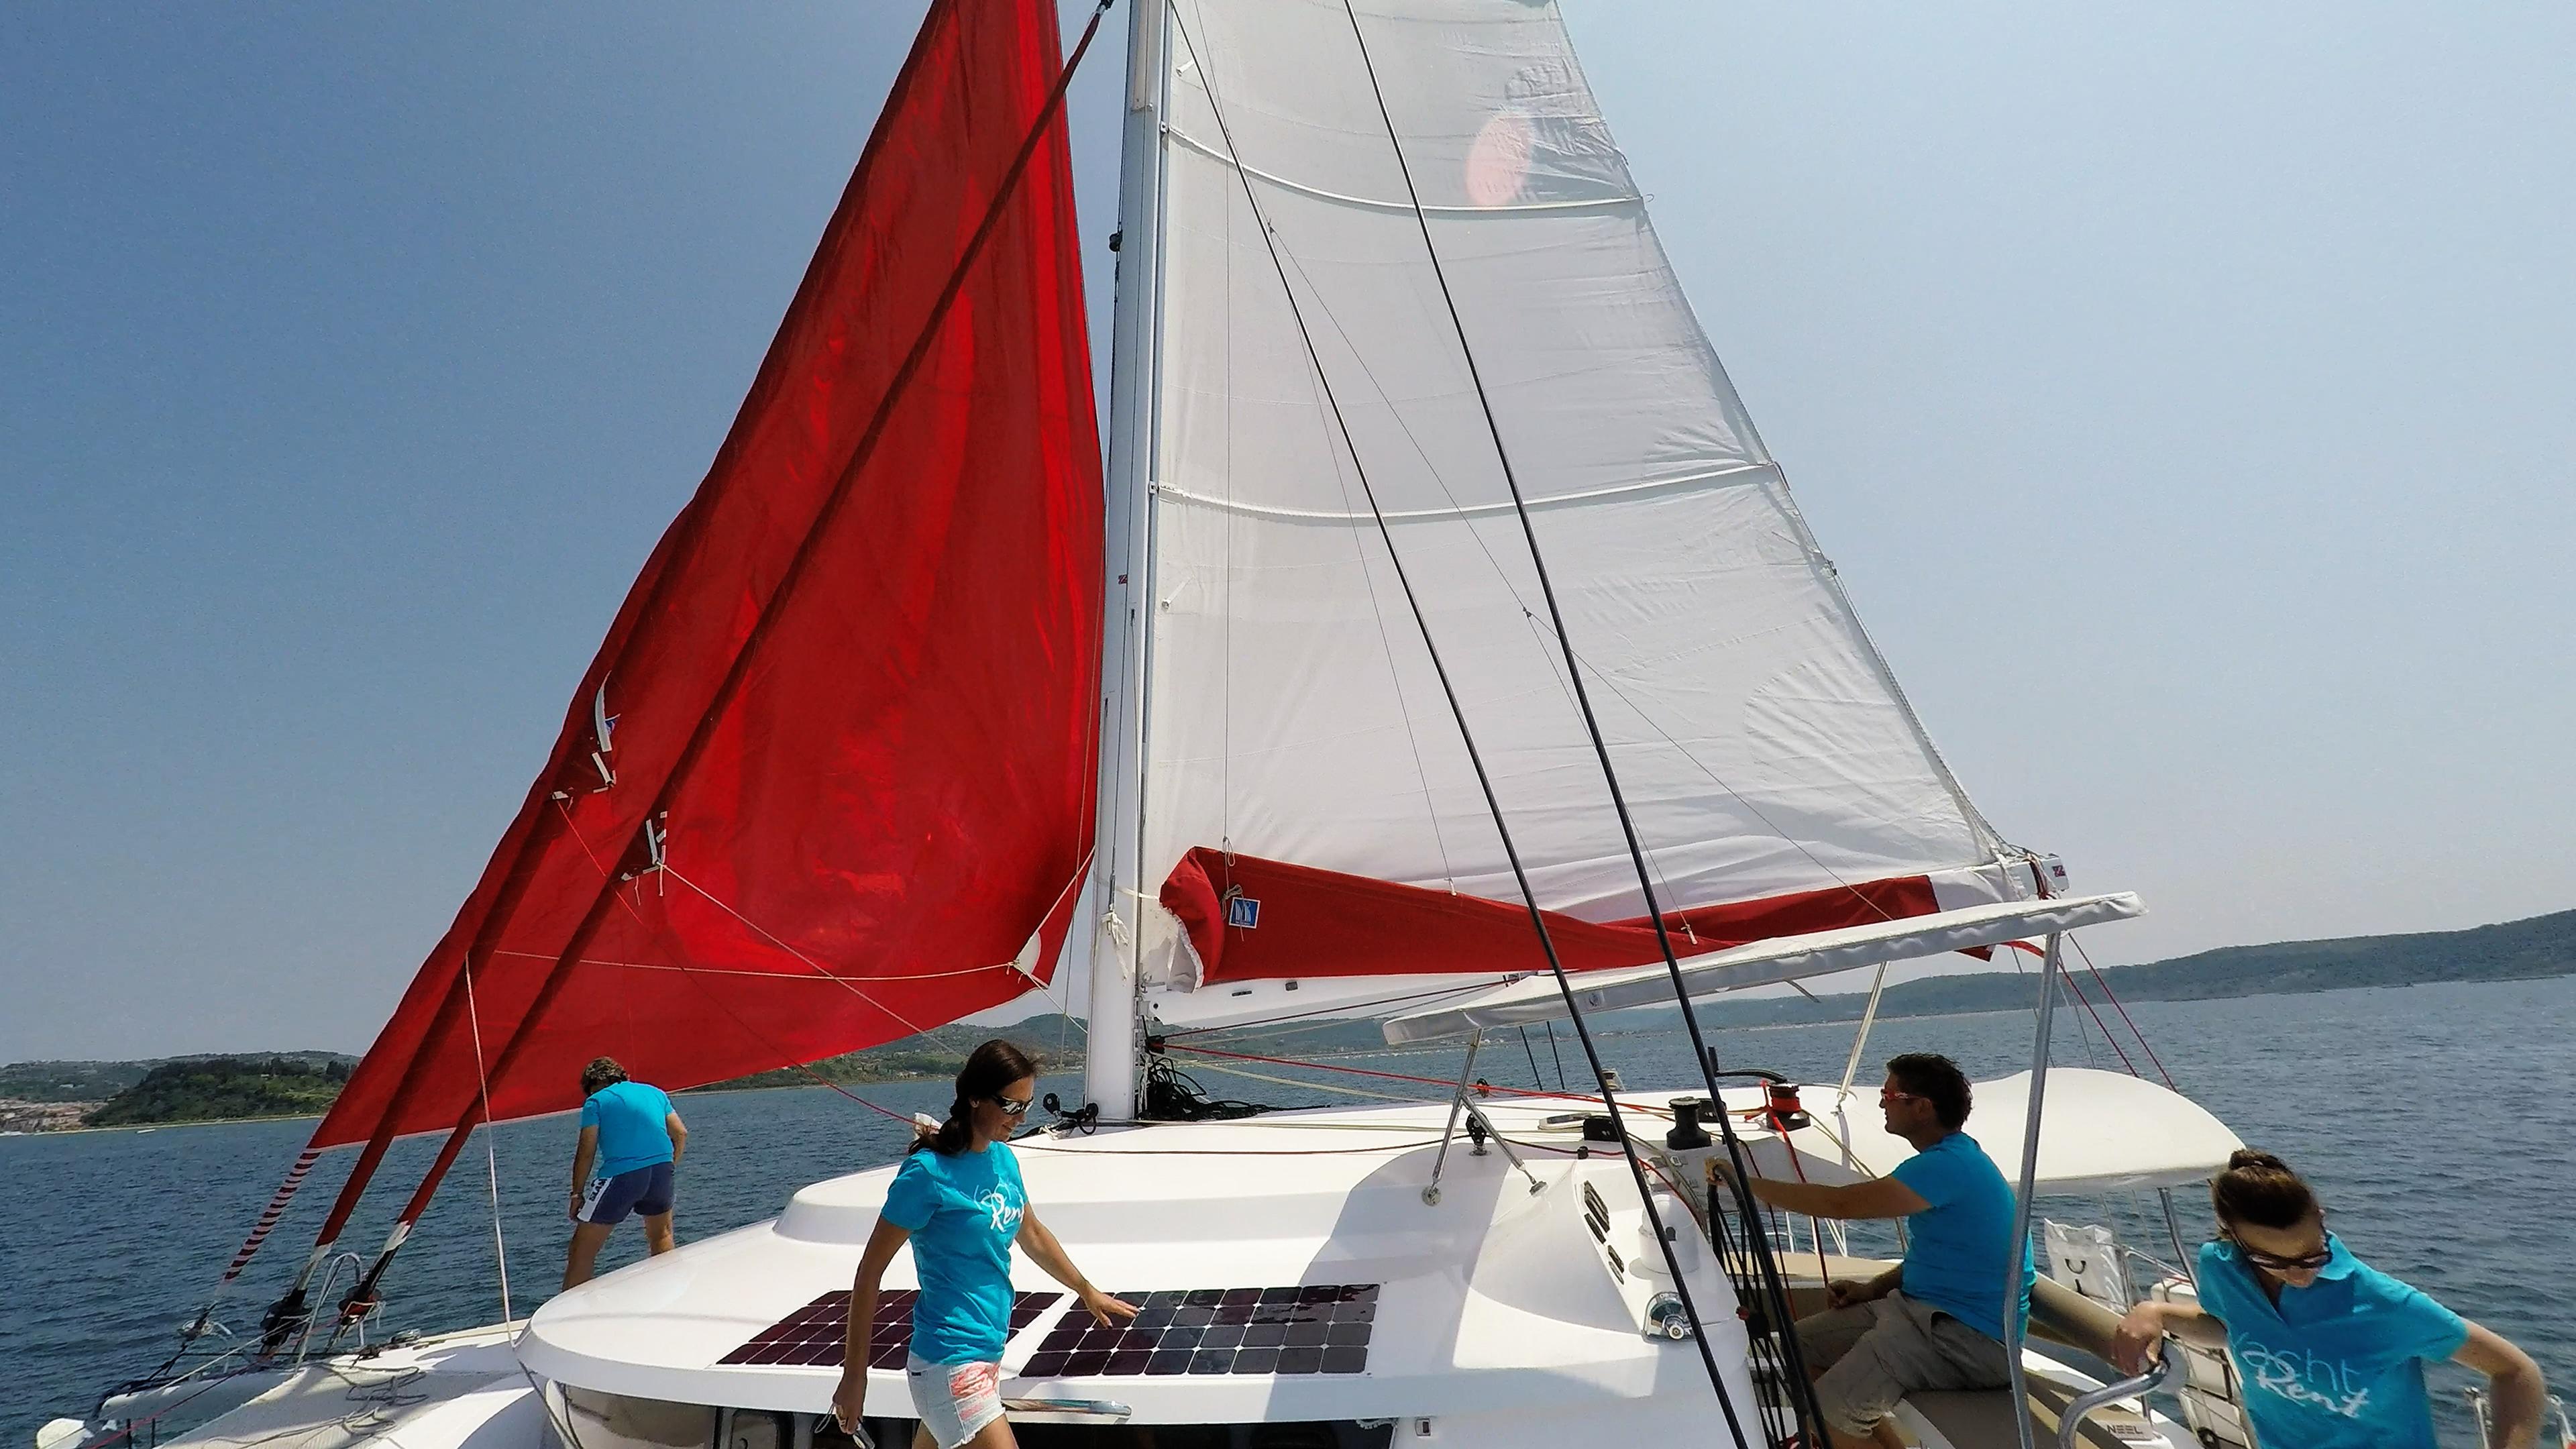 hoisting gennaker sul barca a vela